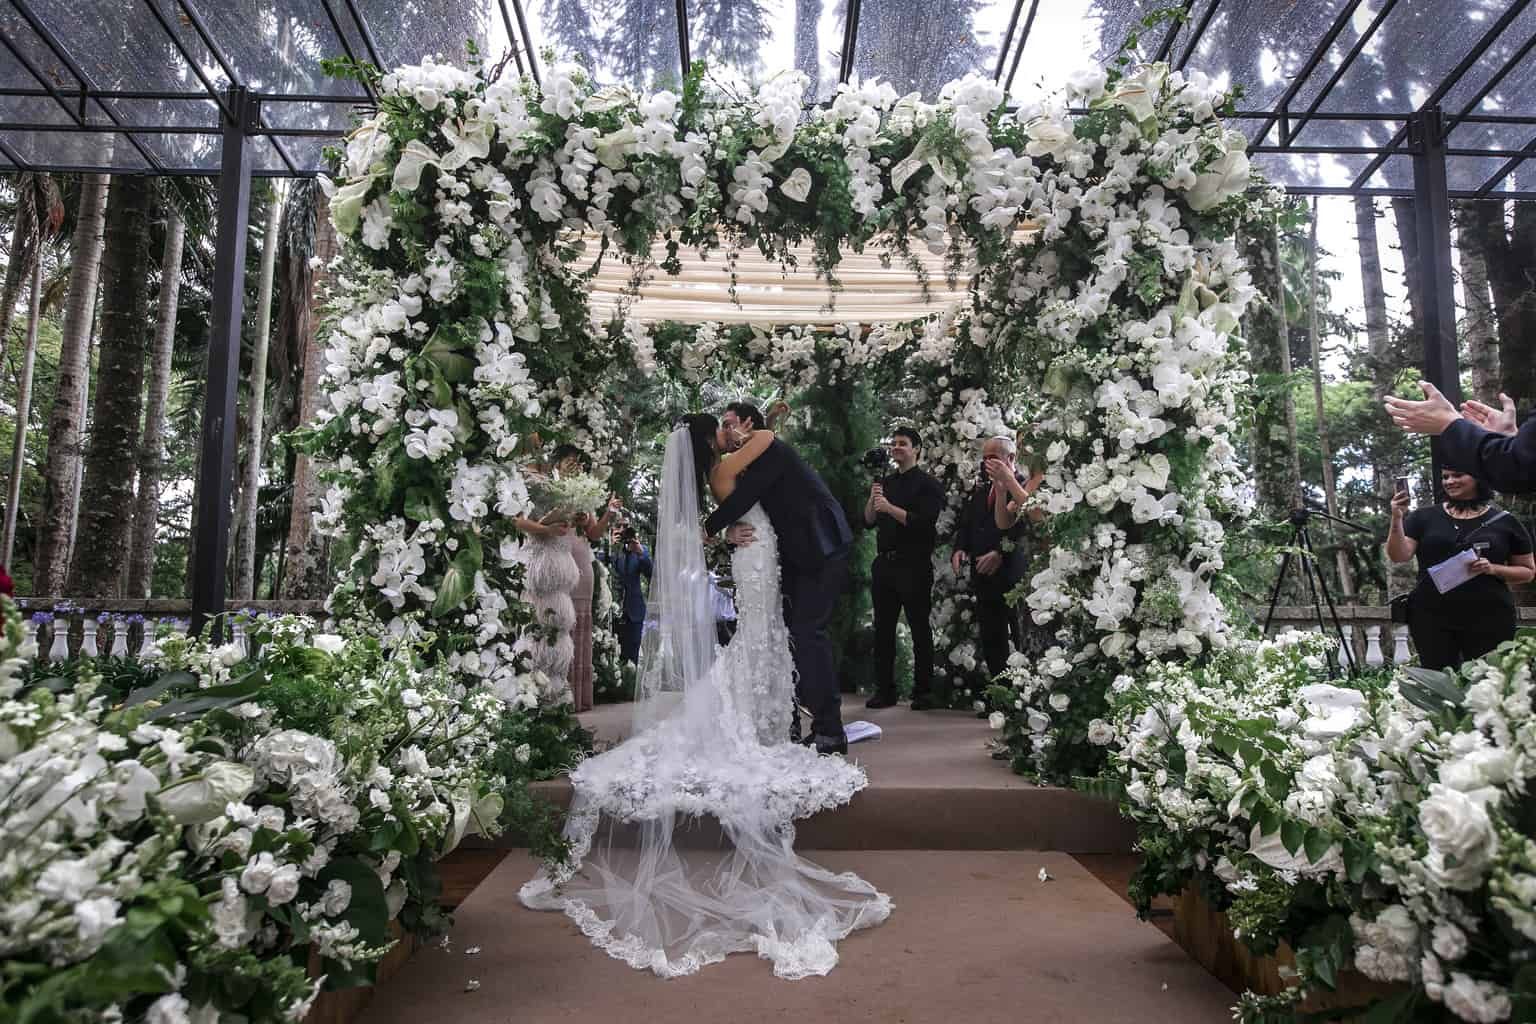 Fernanda-e-Max-Fazenda-Santa-Barbara-Foto-Torin-Zanette-Fabio-e-Telma-Decorações-cerimonia-1661